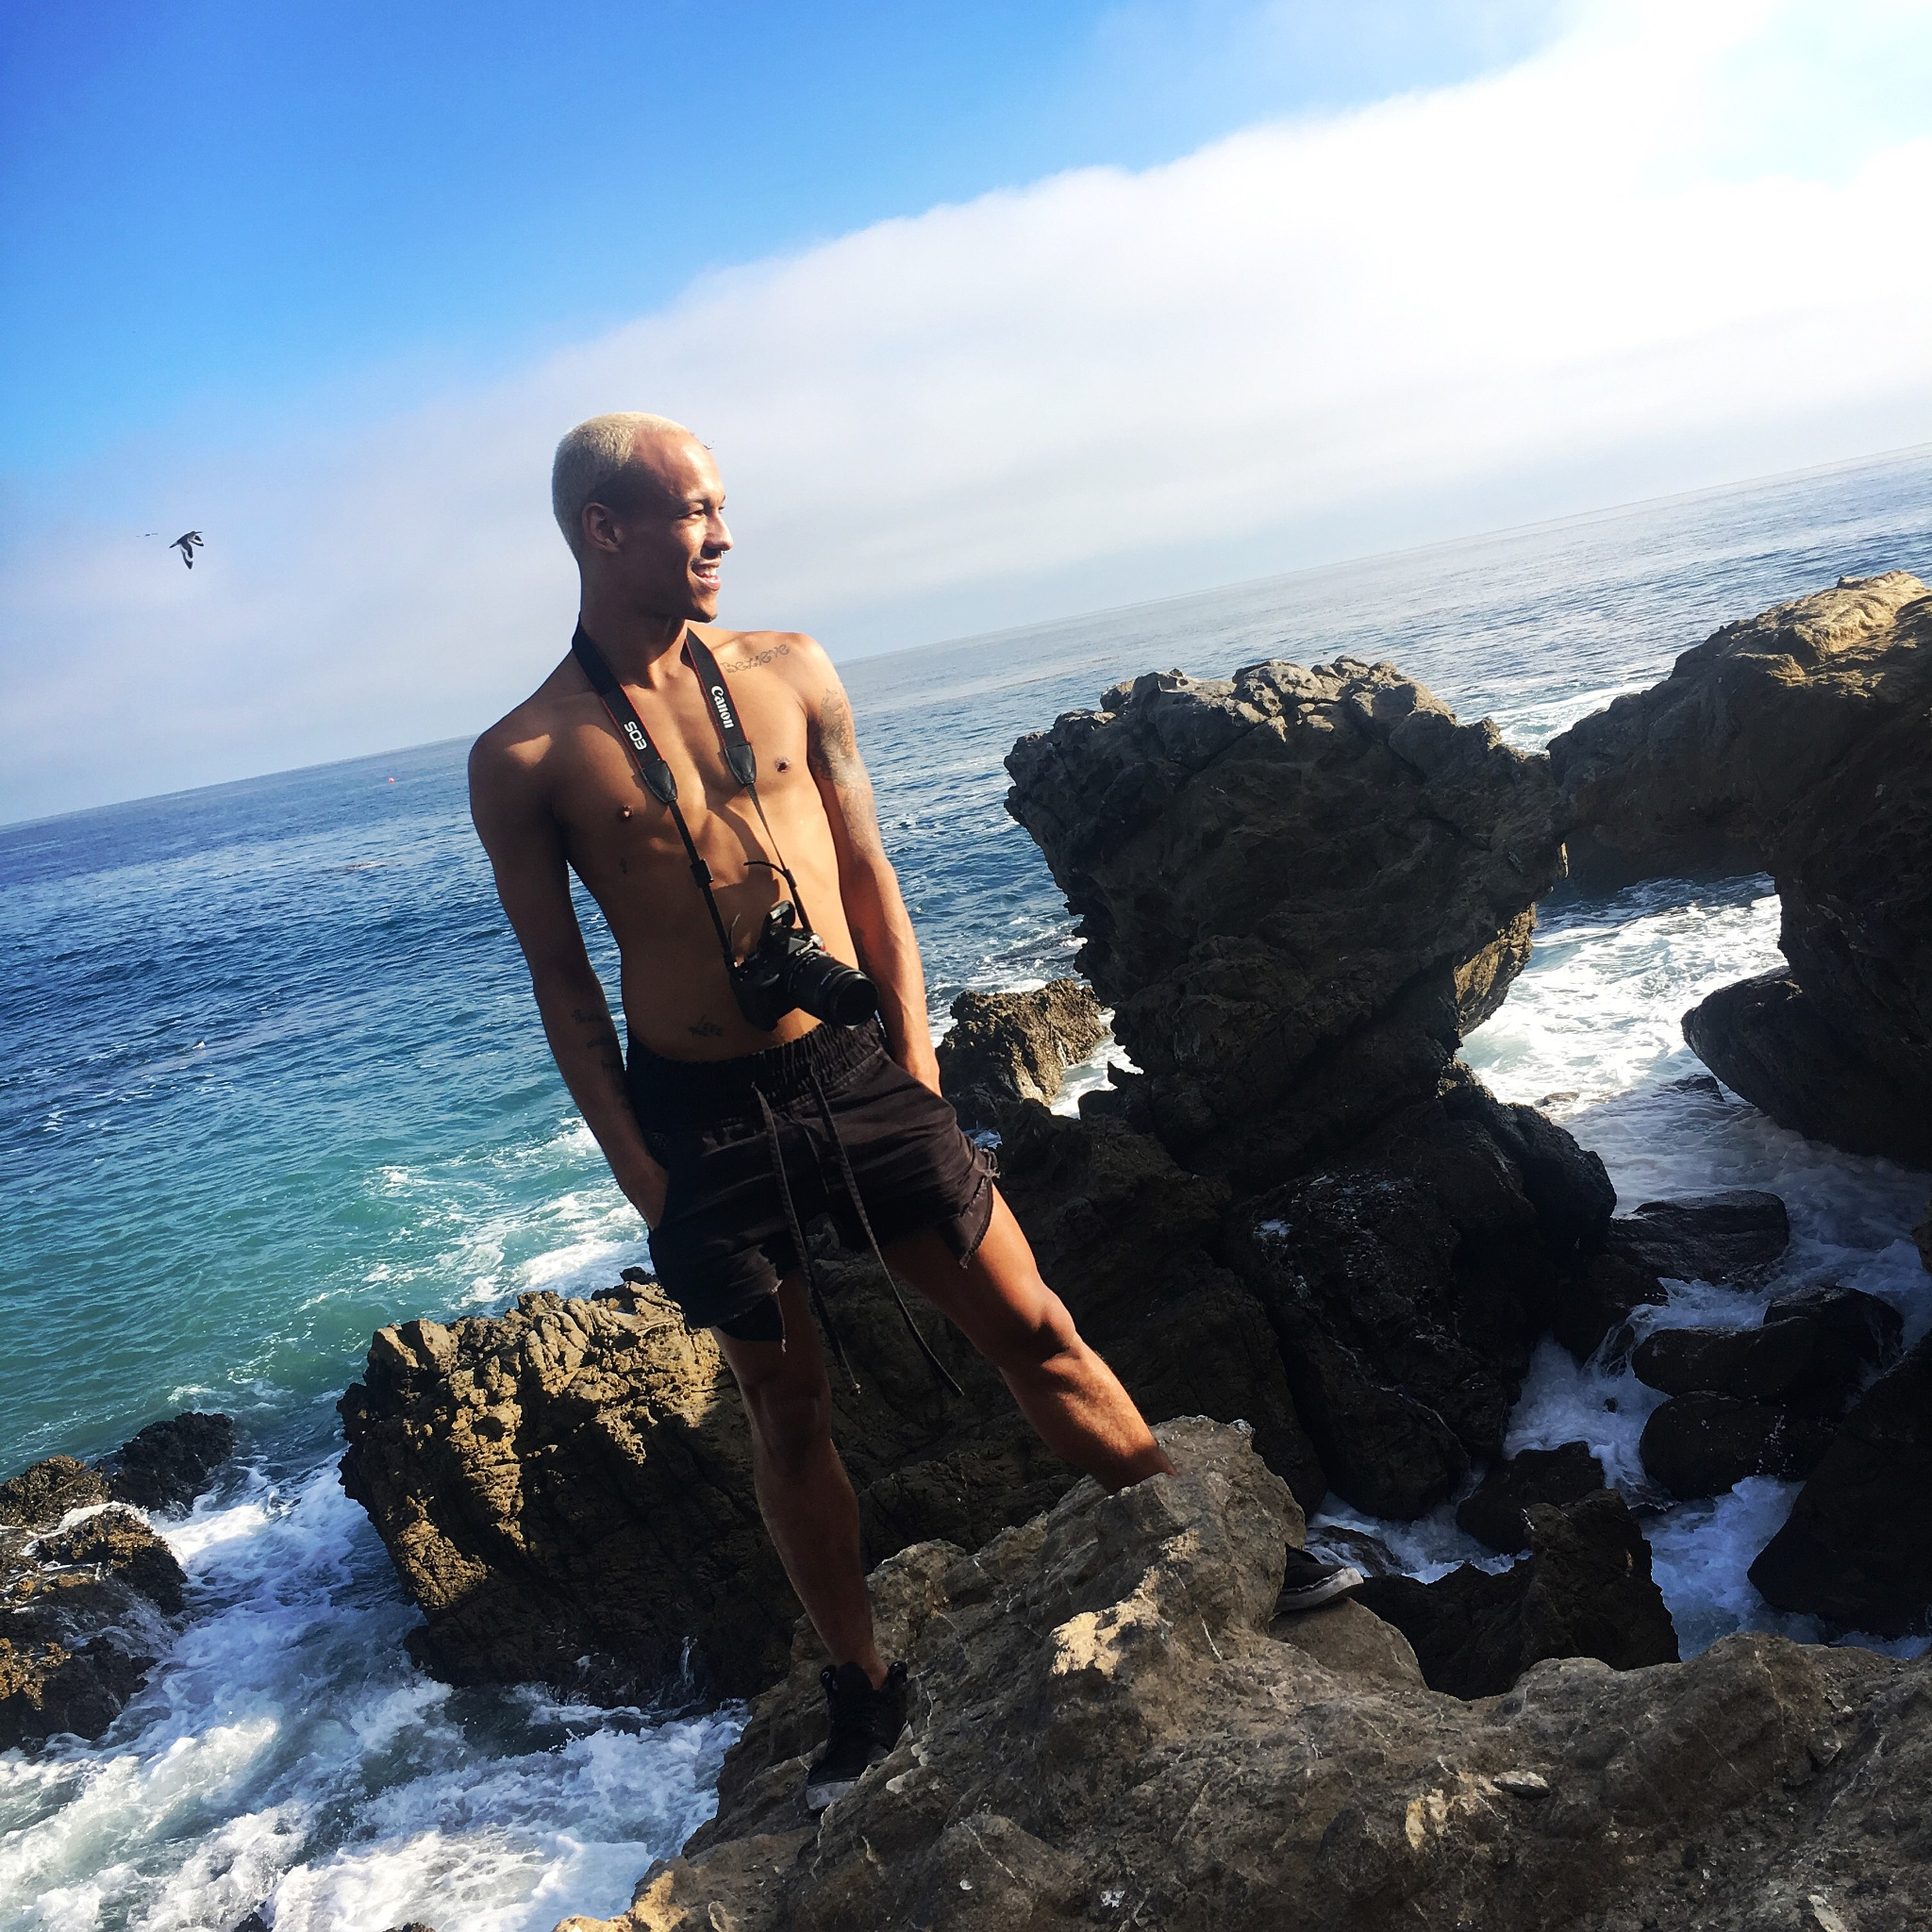 Malibu beach self portrait. by Dre Young